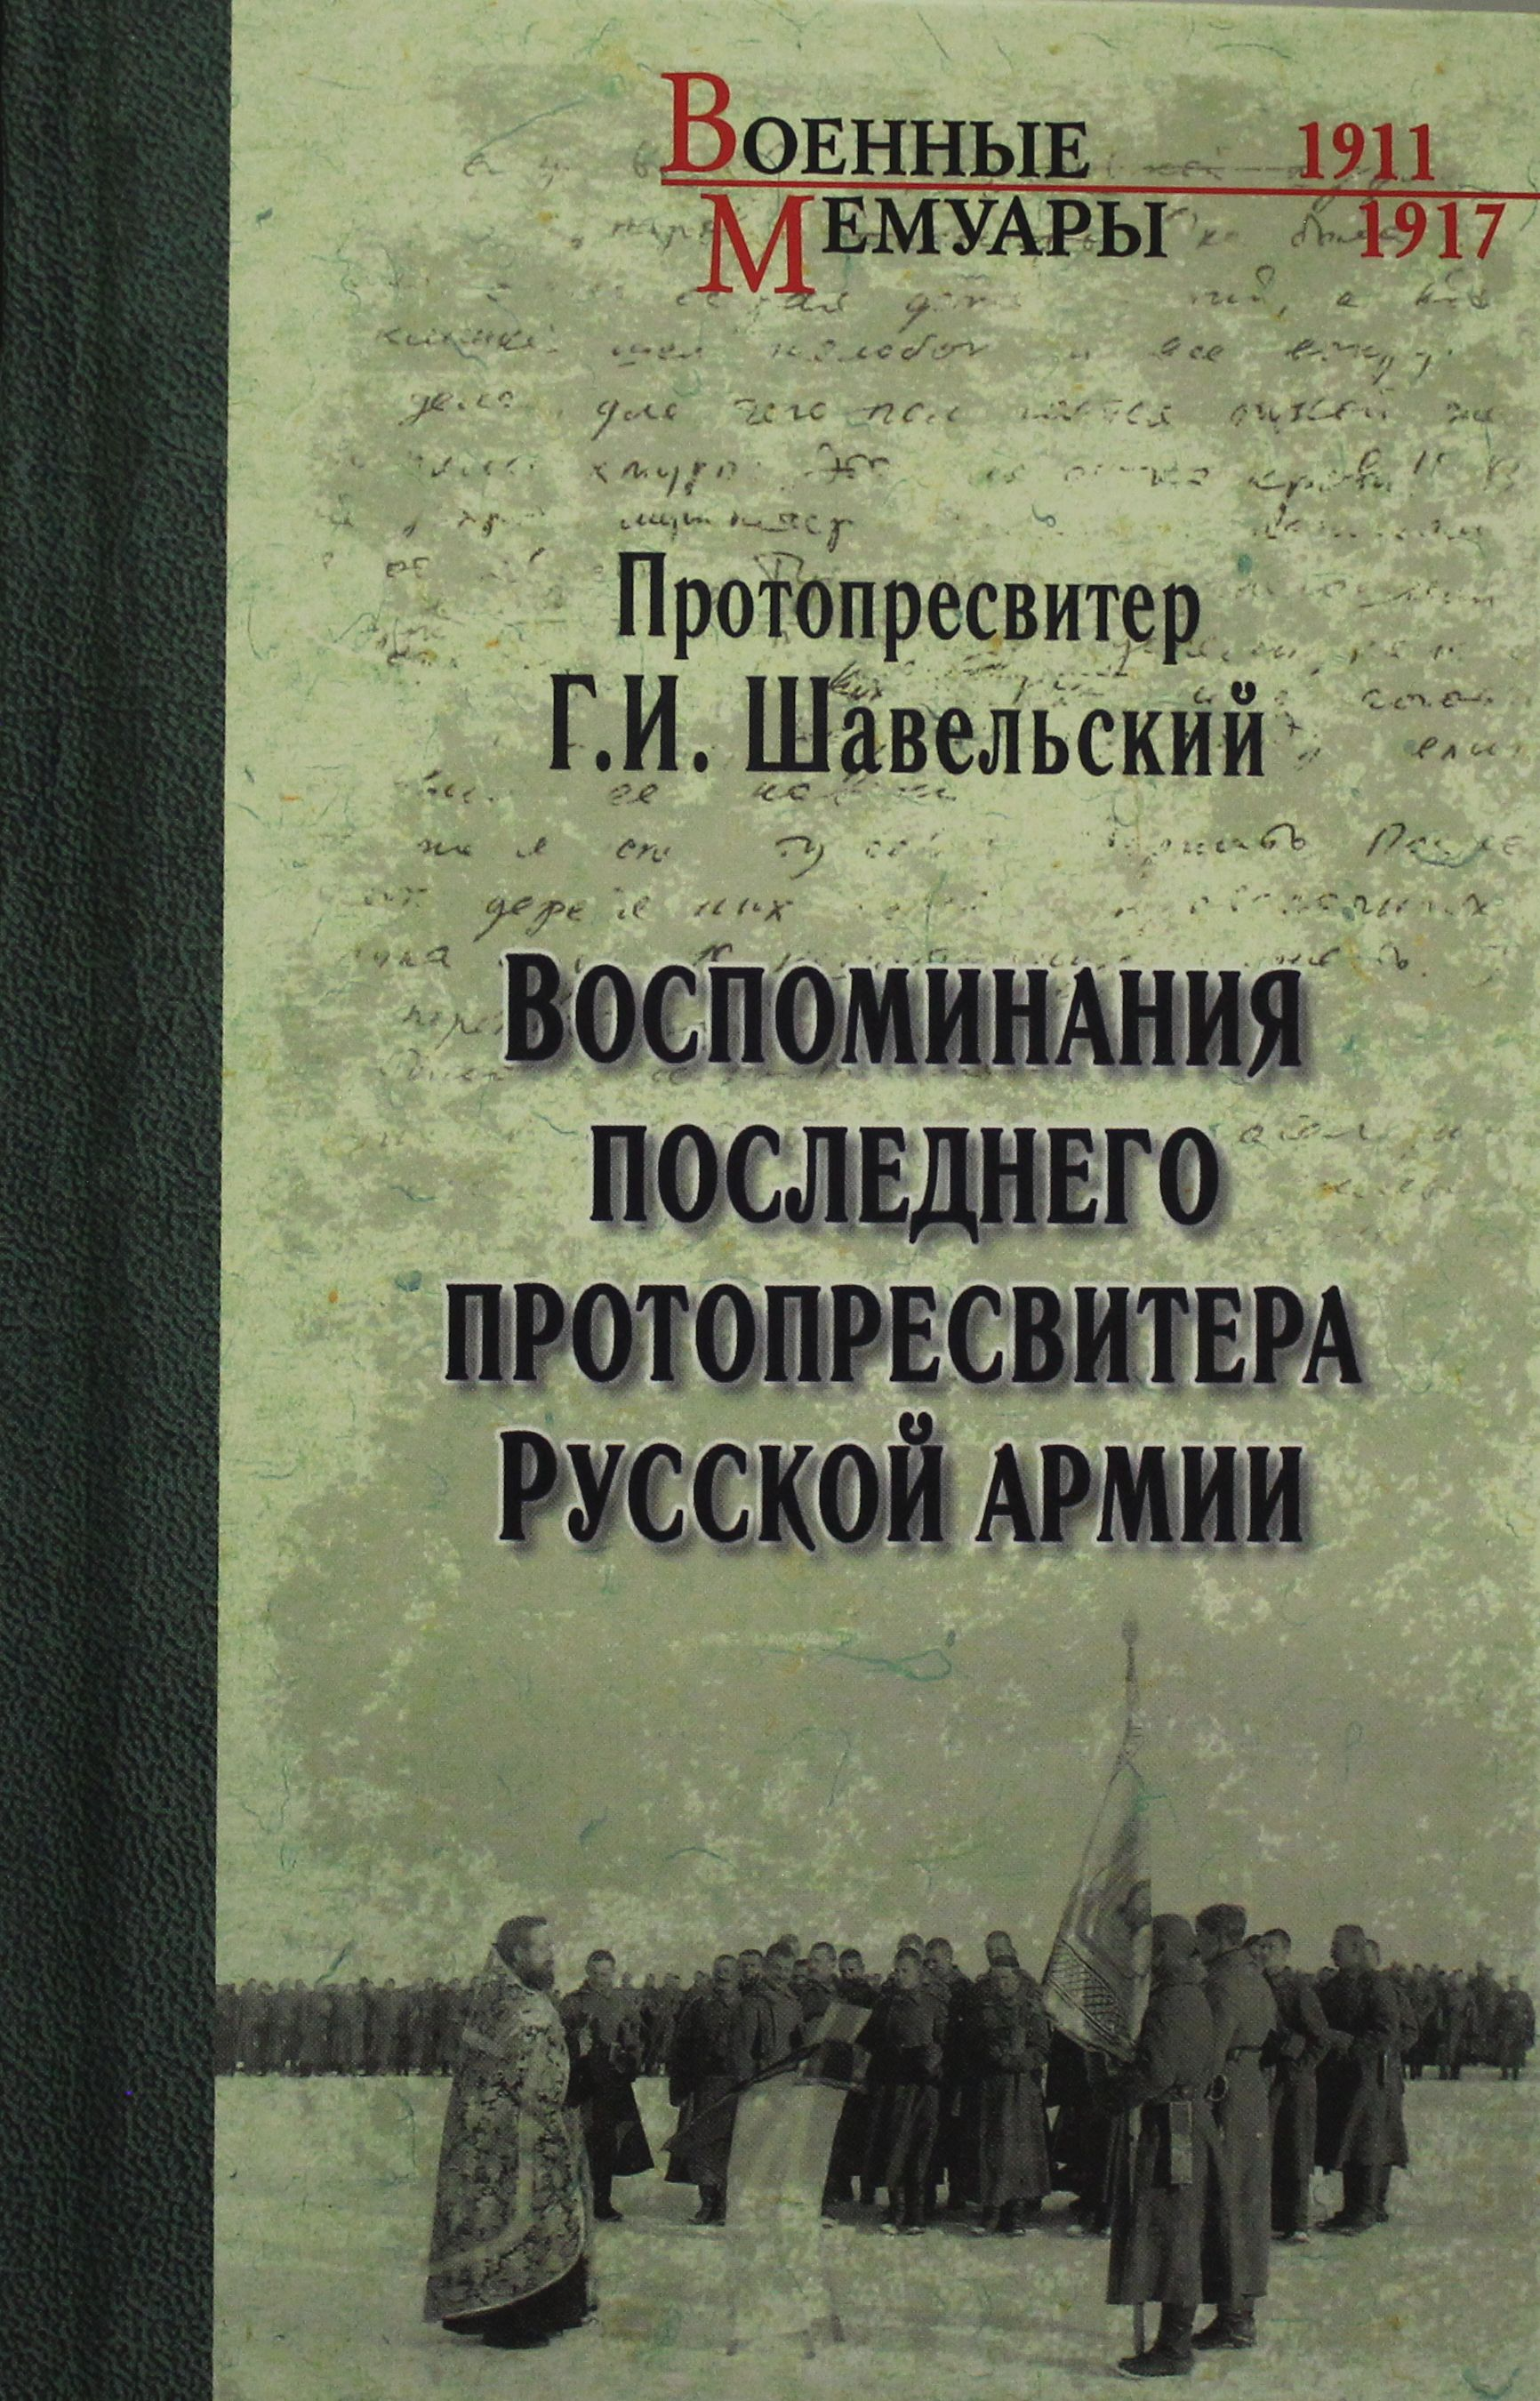 Vospominanija poslednego protopresvitera Russkoj armii